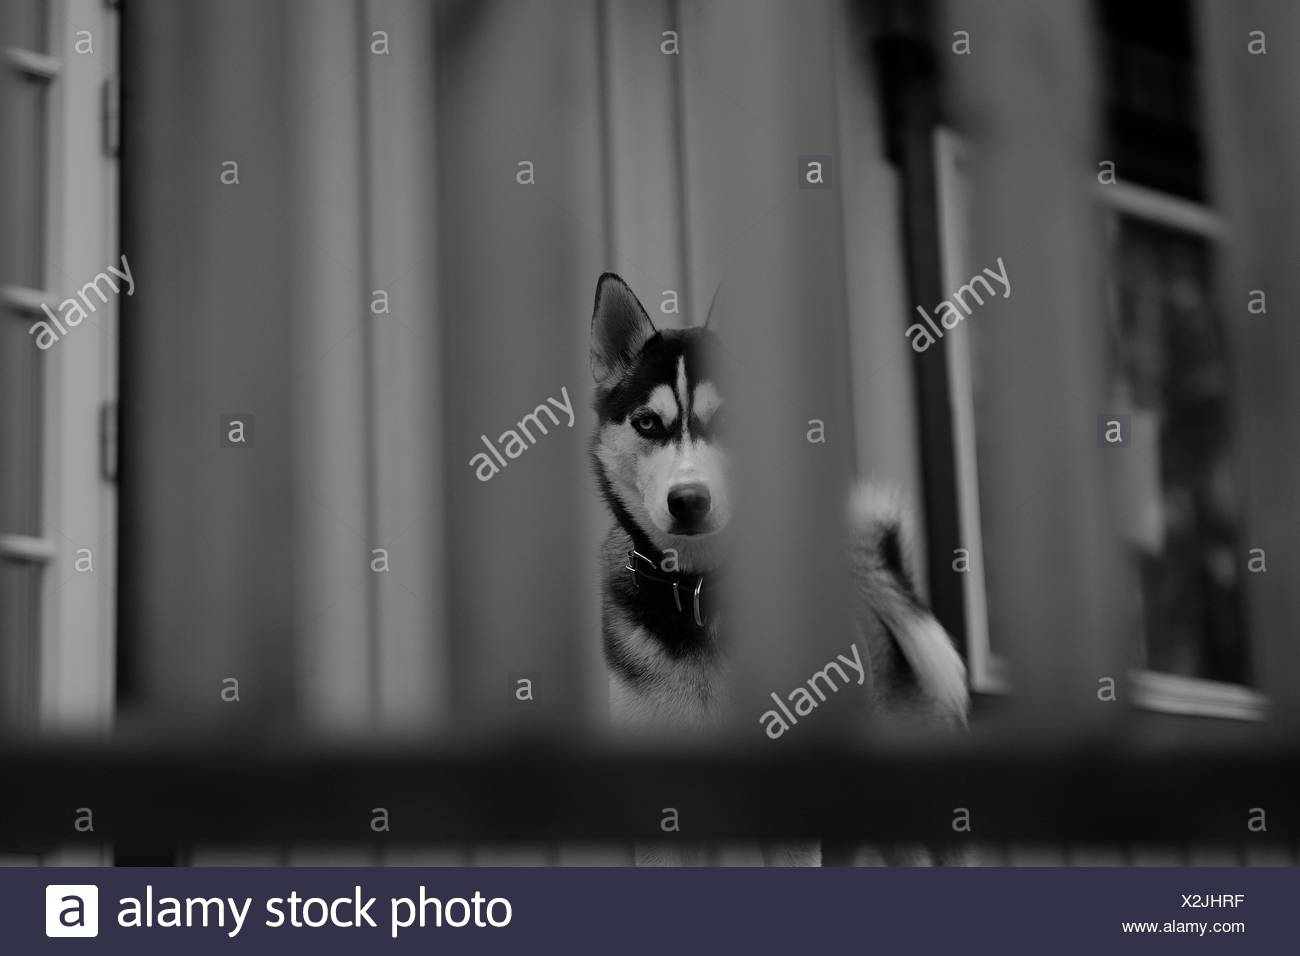 Siberian Husky Outside House Seen Through Fence - Stock Image